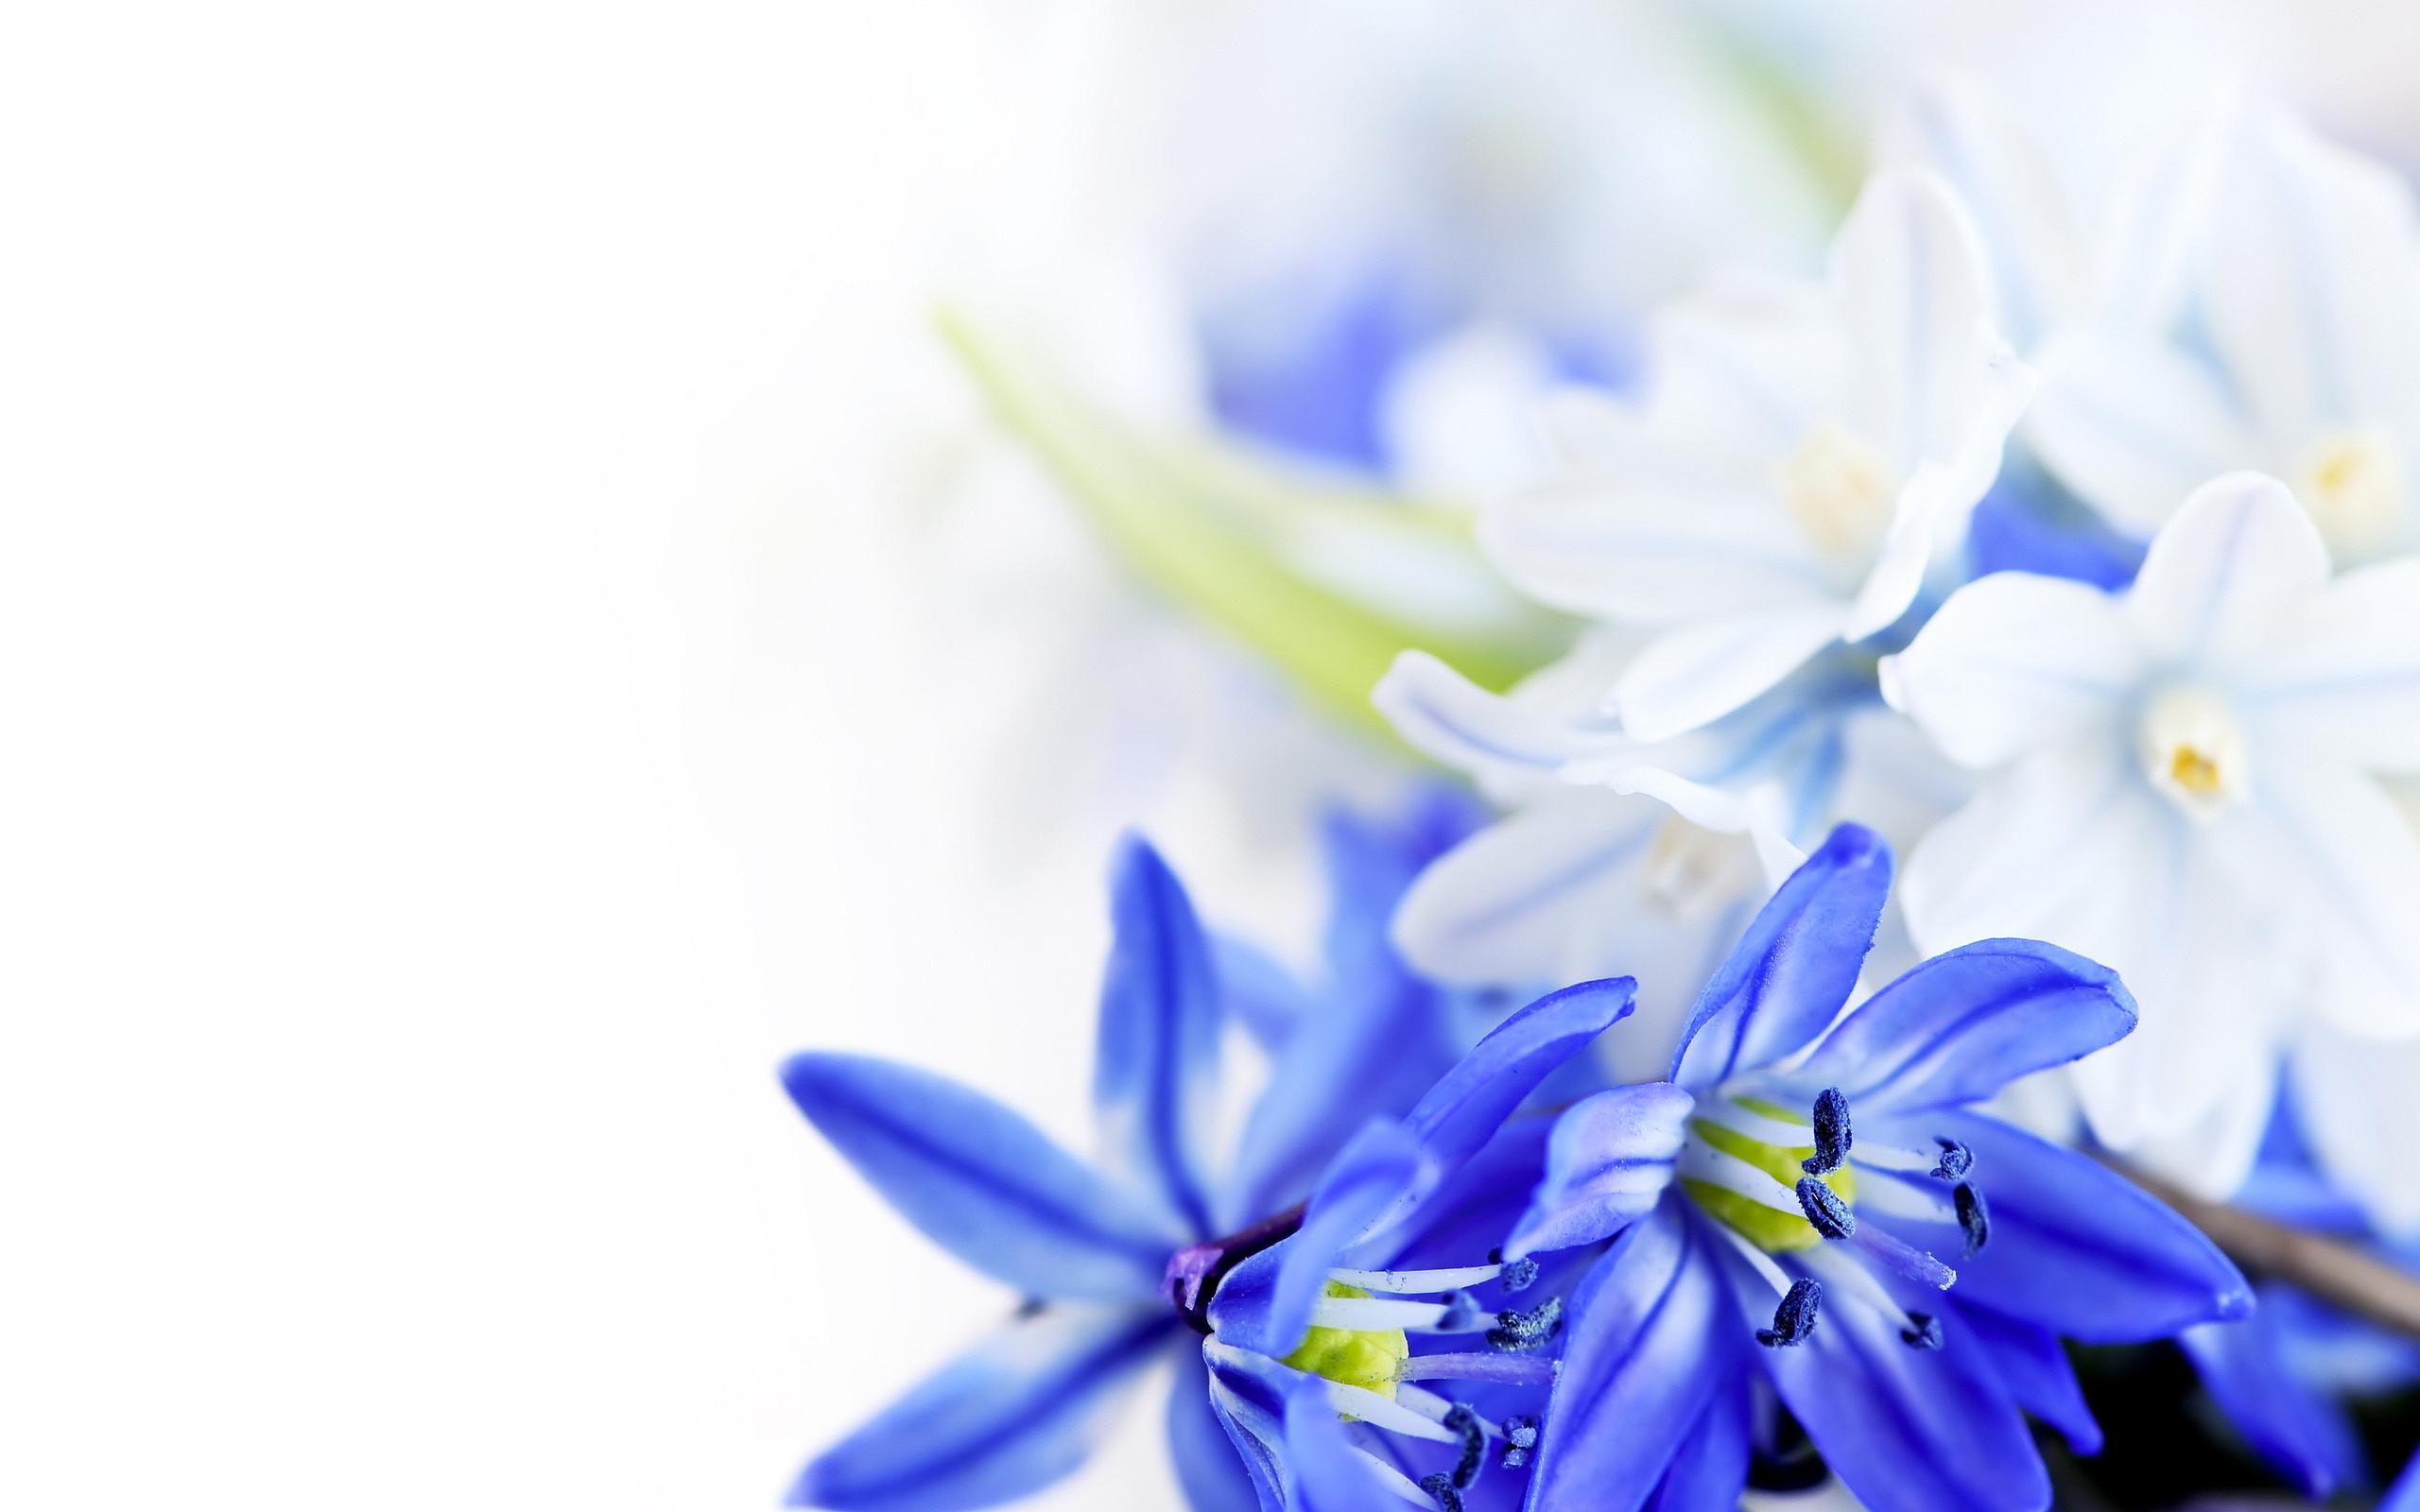 Www 3d Flower Wallpaper Com White Floral Wallpaper 10 Cool Hd Wallpaper